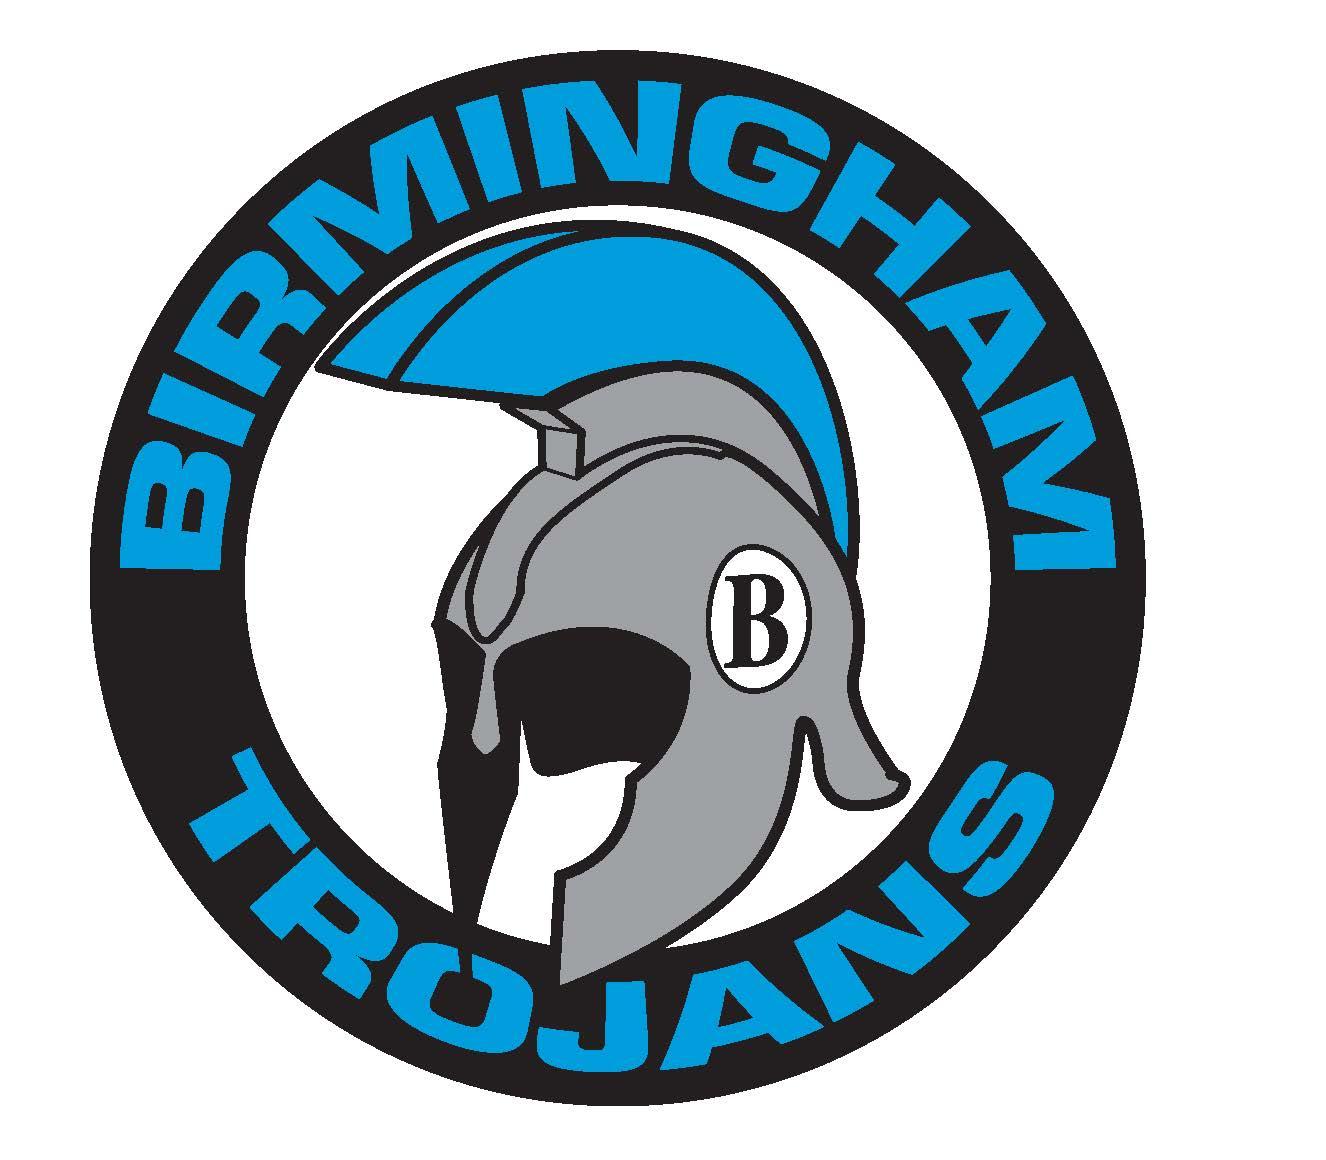 Birmingham Trojans (2).jpg